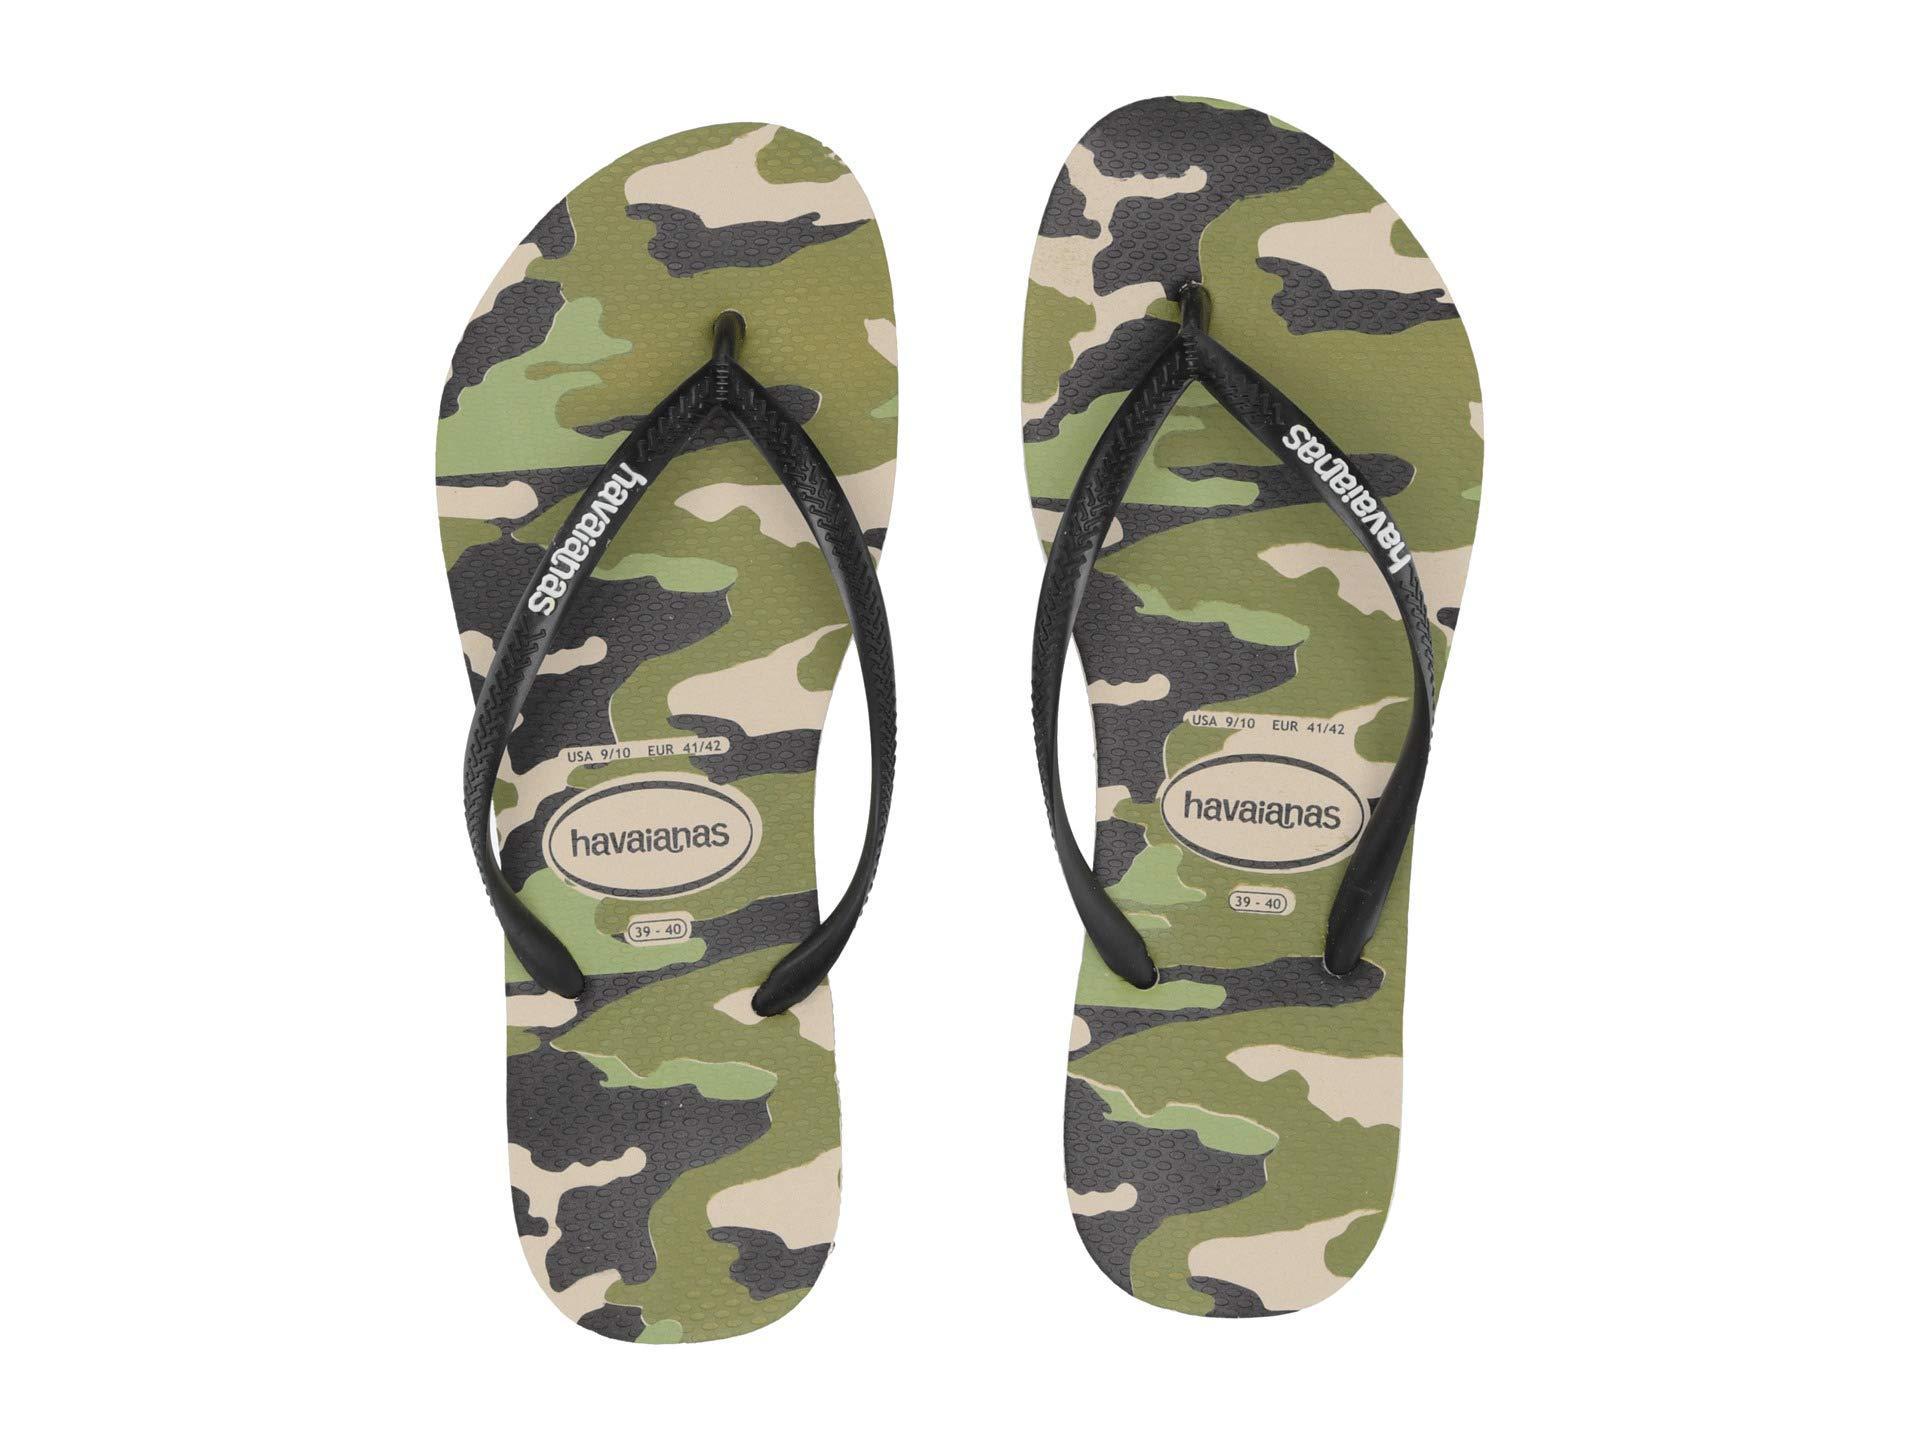 93b5e9205b8 Havaianas - Natural Slim Camo Sandal (beige black) Women s Sandals - Lyst.  View fullscreen